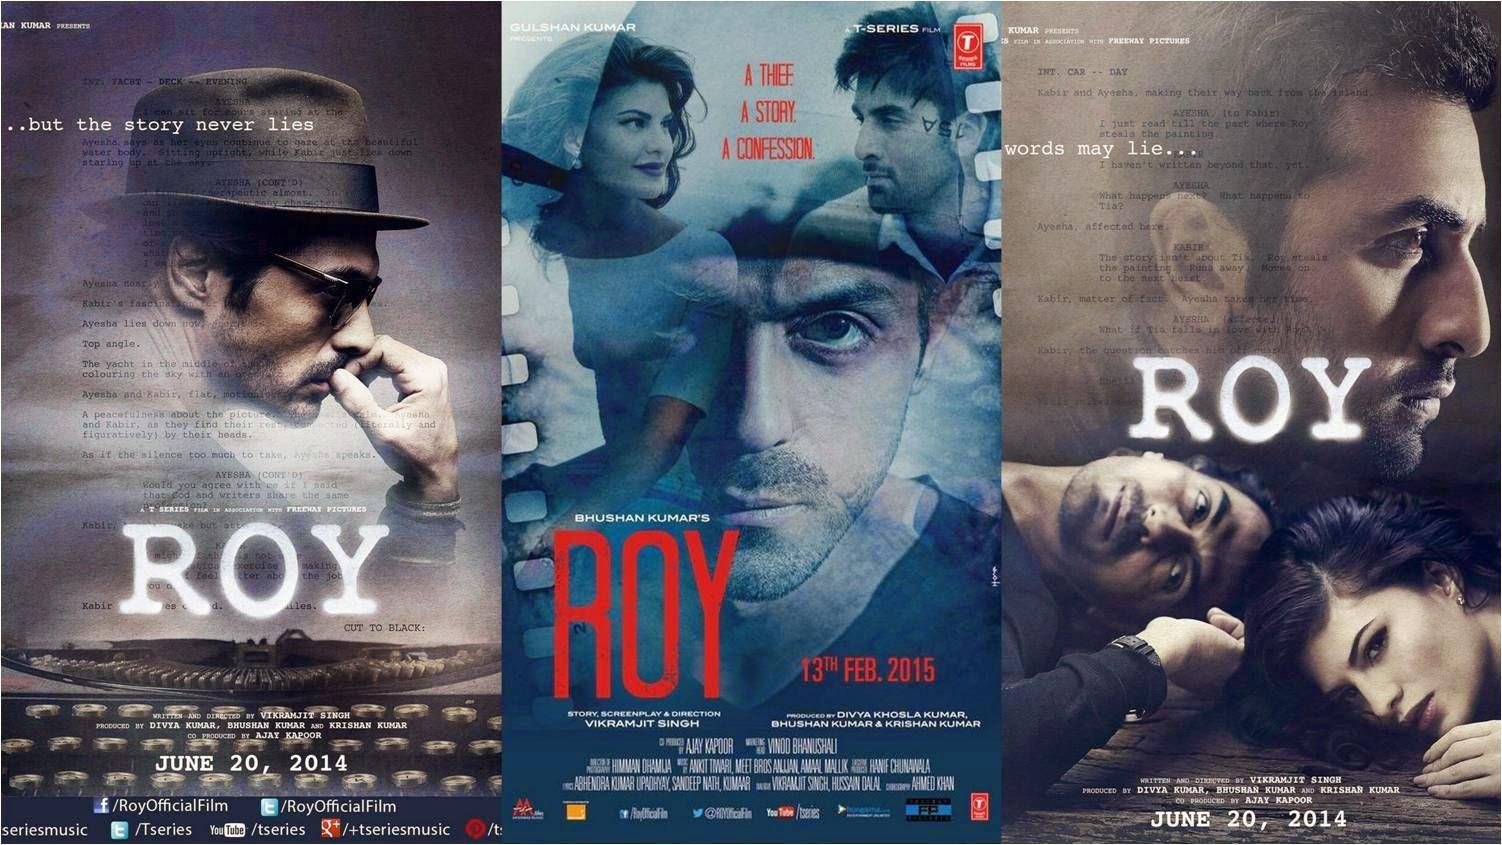 Ranbir Kapoor, Jacqueline Fernandez, and Arjun Rampal in Roy Posters